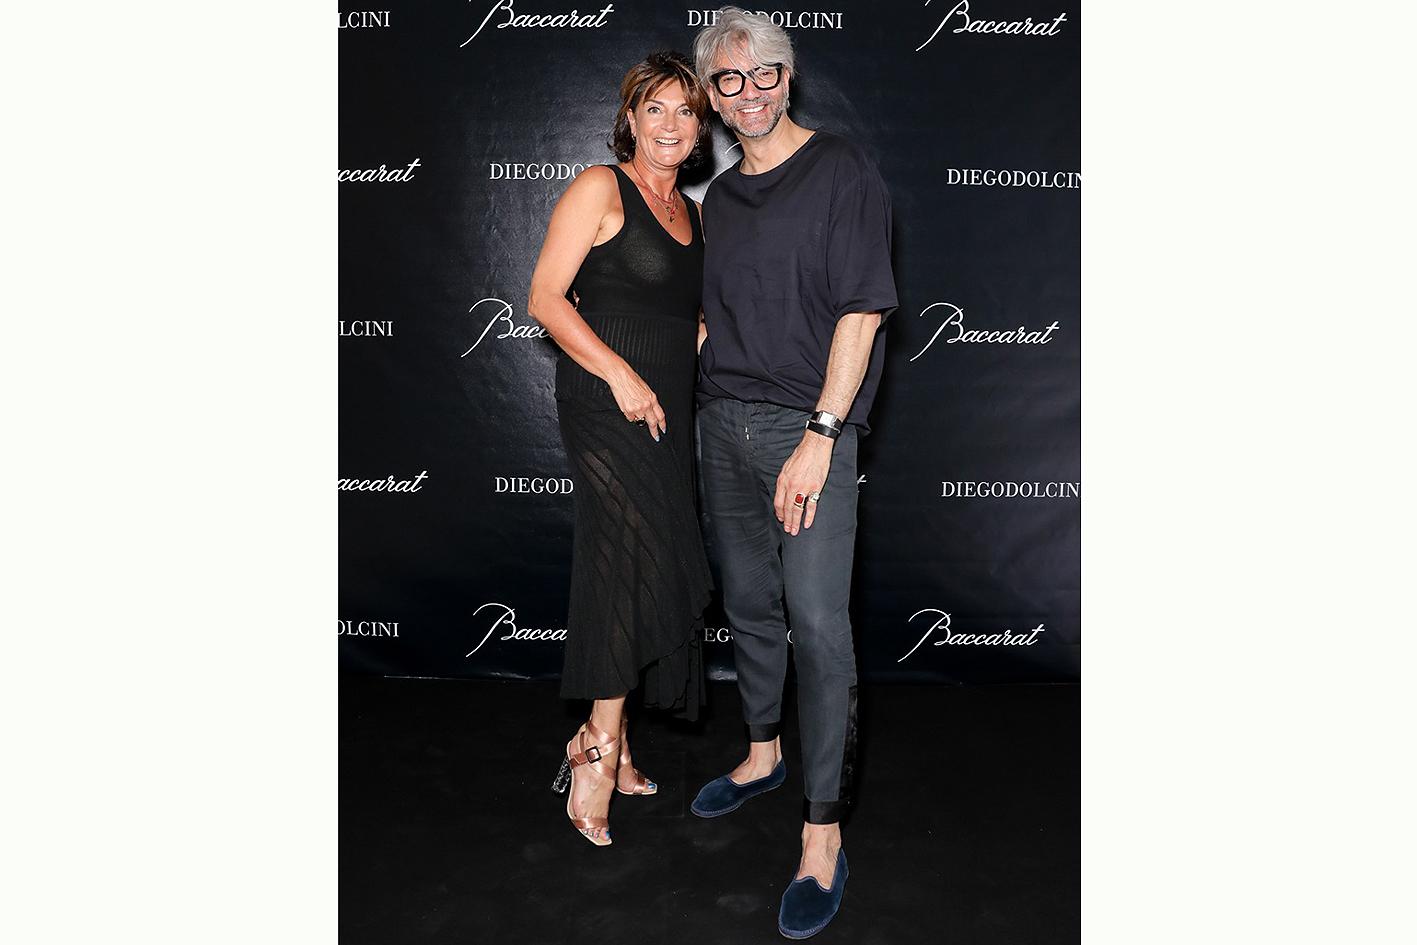 4 Daniela Riccardi CEO Baccarat e Diego Dolcini